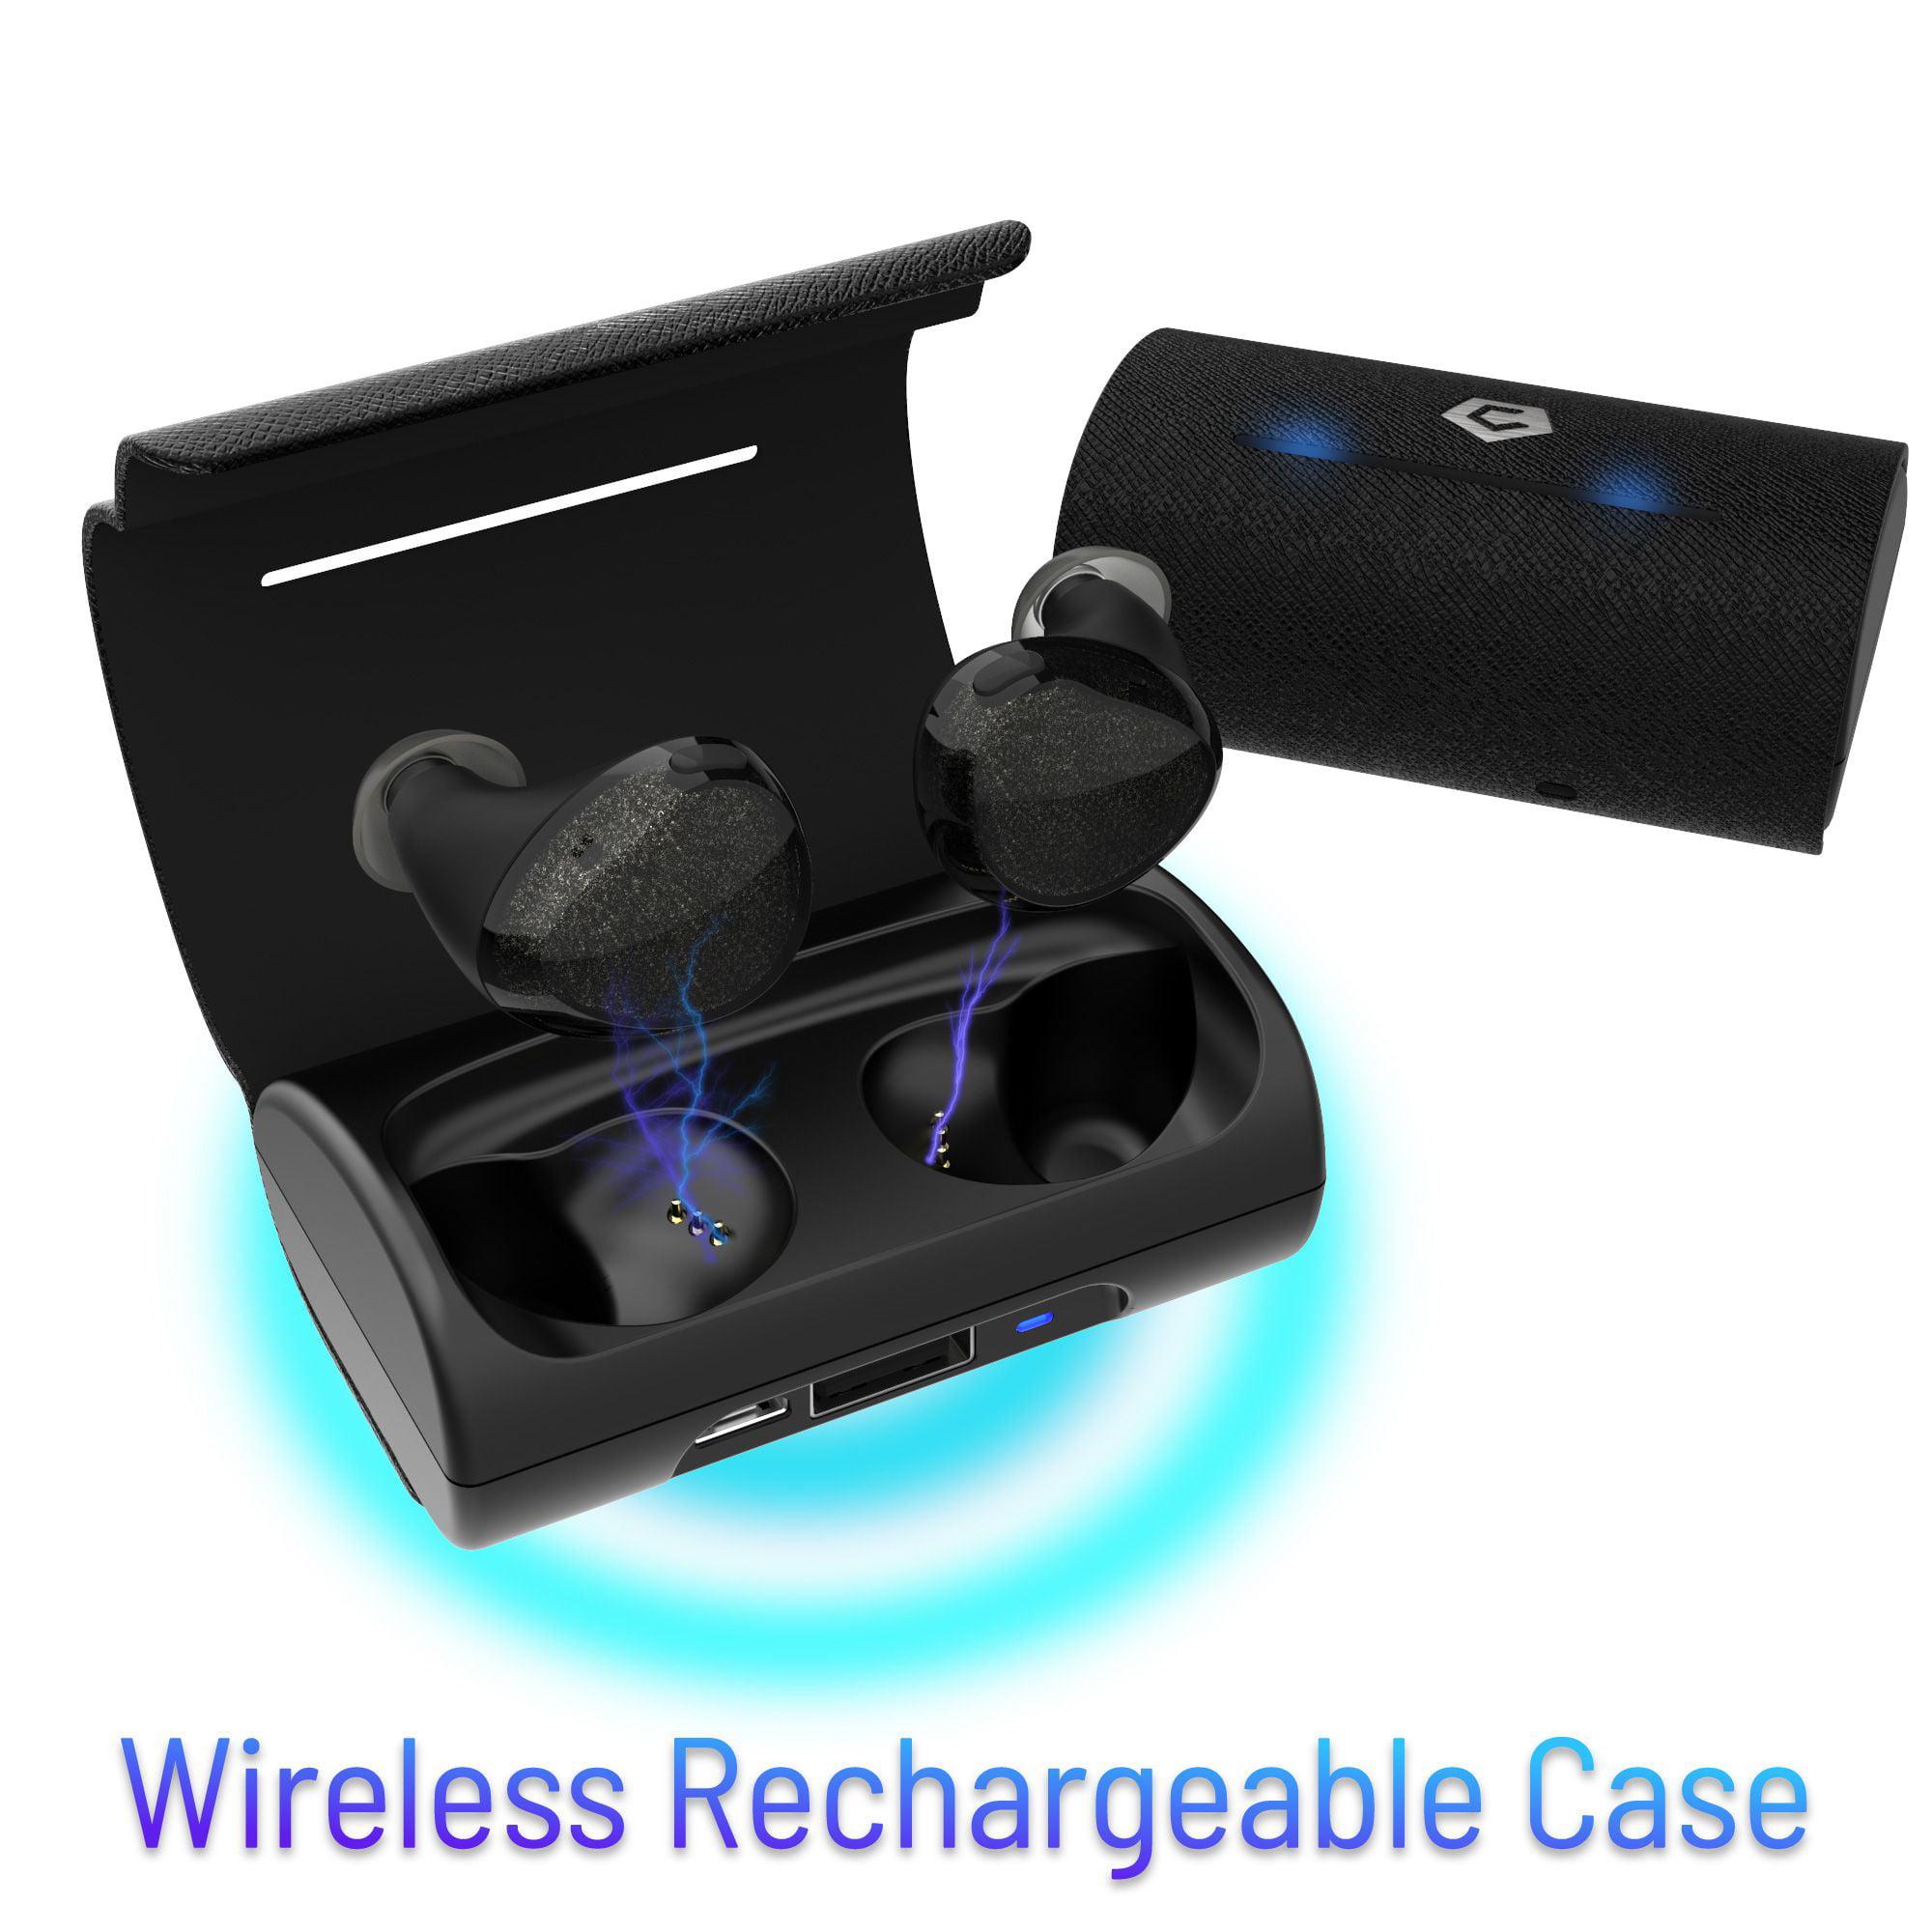 20cffd02083 Cobble Pro Universal True Wireless Earbuds Bluetooth 5.0 In-ear Earphones  w/ Mic & Charging Case for Running Workout - Walmart.com